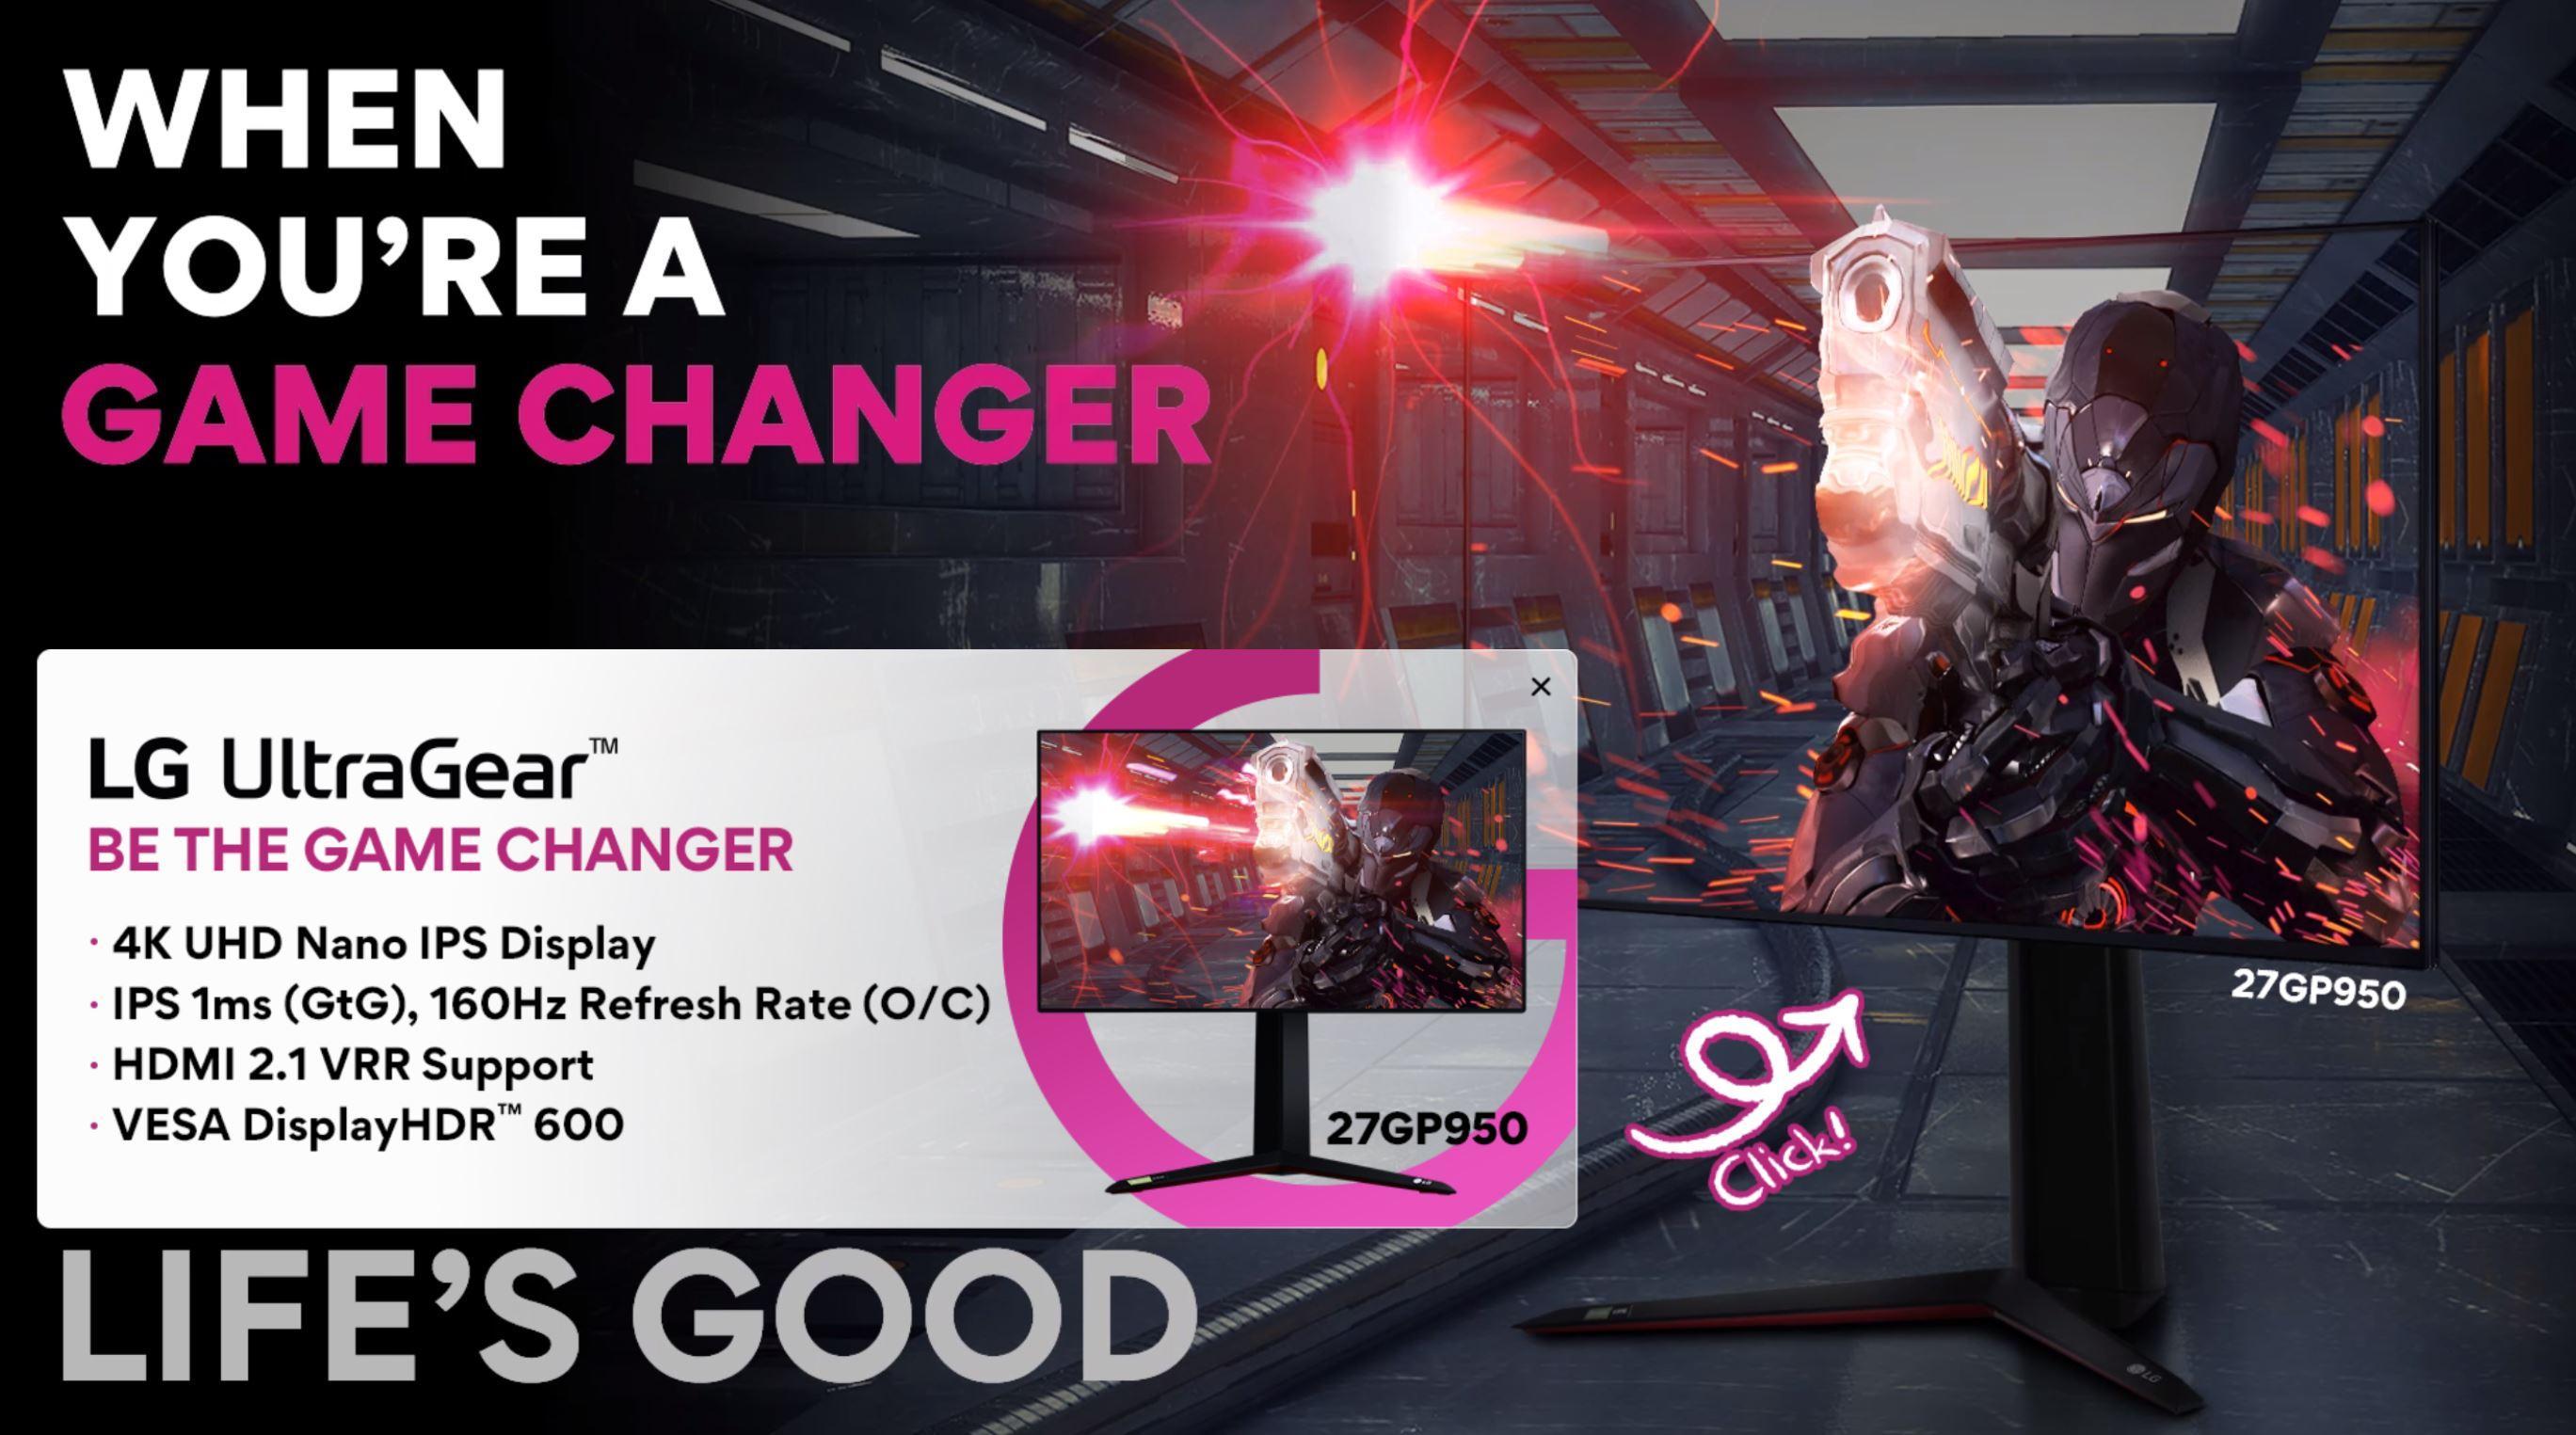 Lg Ultragear 27gp950 écran Pc 4k Hdmi 2.1